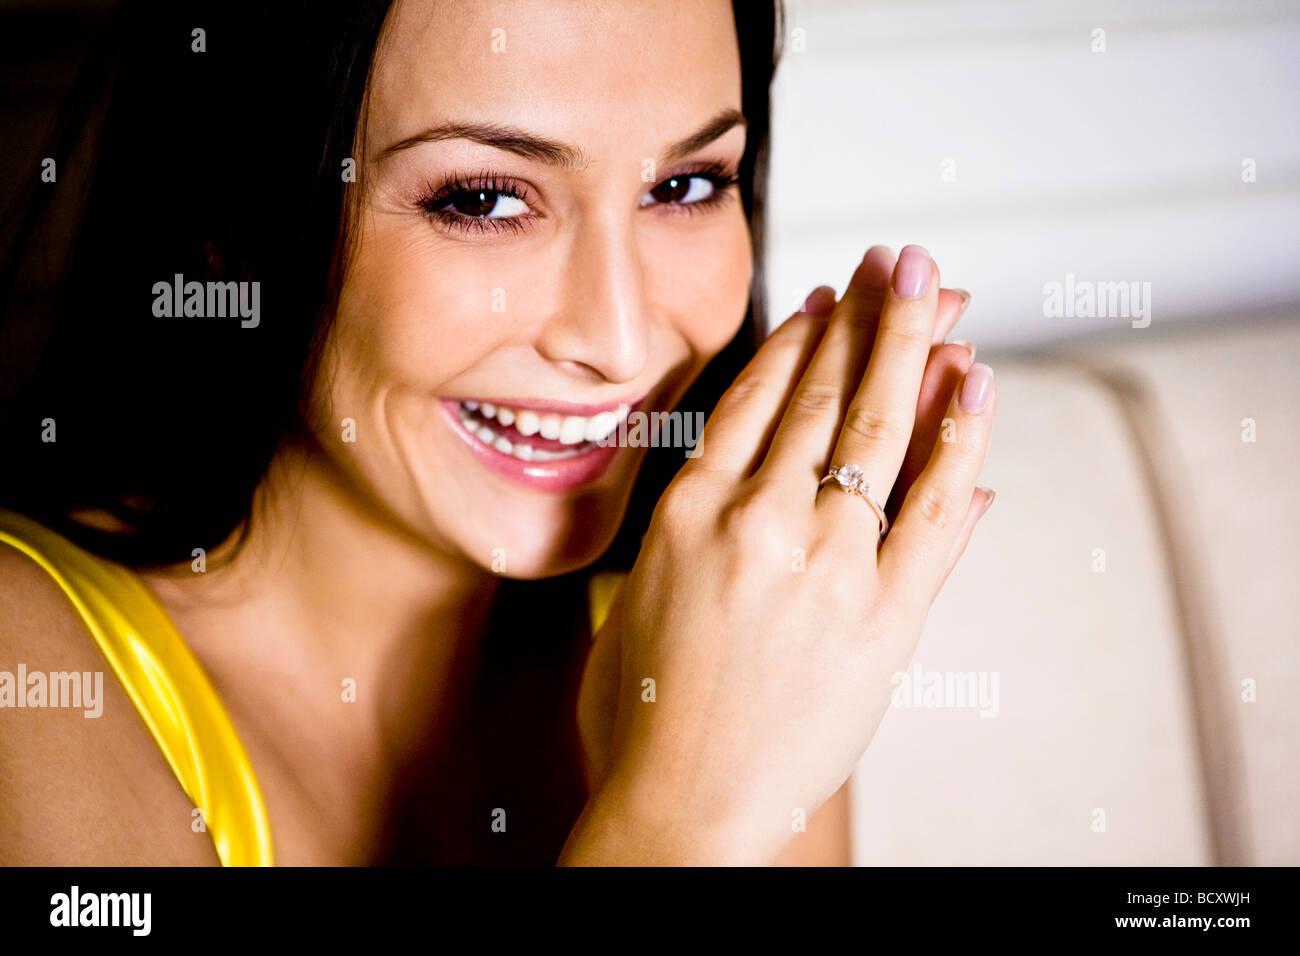 Junge Frau Tragen Verlobungsring Stockfoto Bild 25177113 Alamy